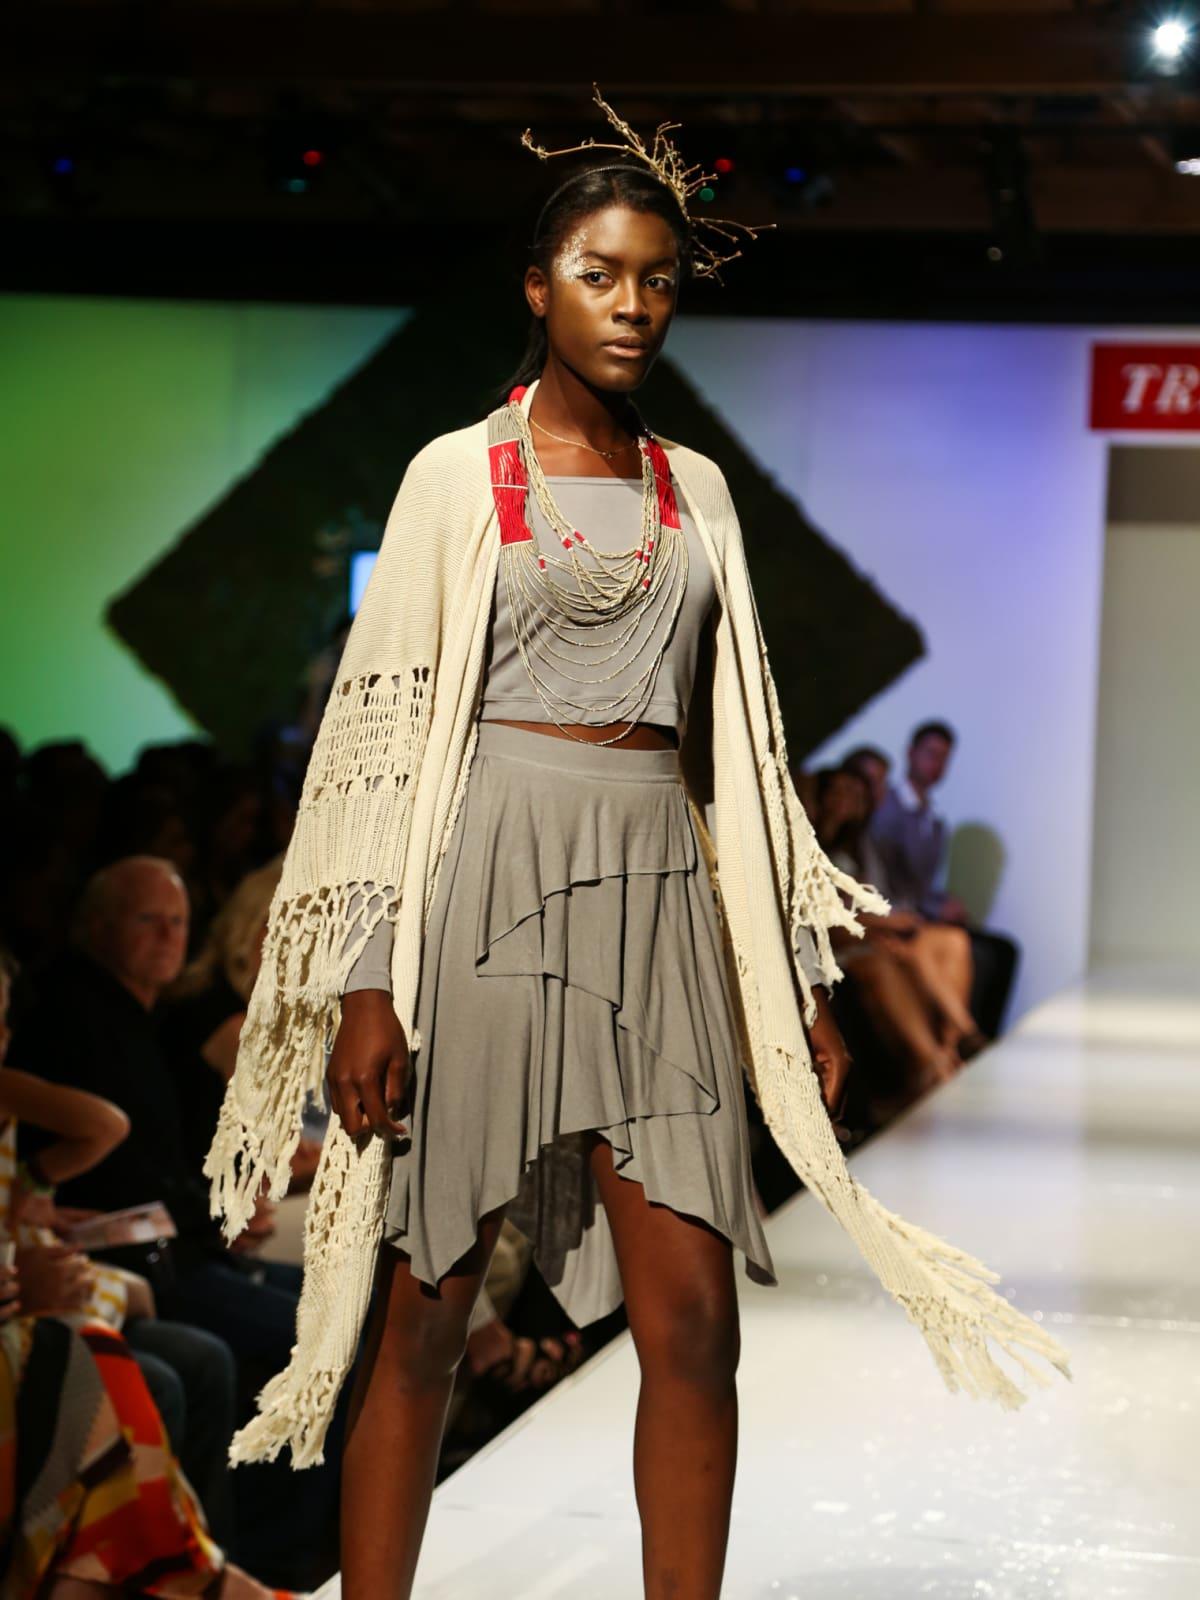 Tribeza Fashion Show 2015 at Brazos Hall Raven + Lily